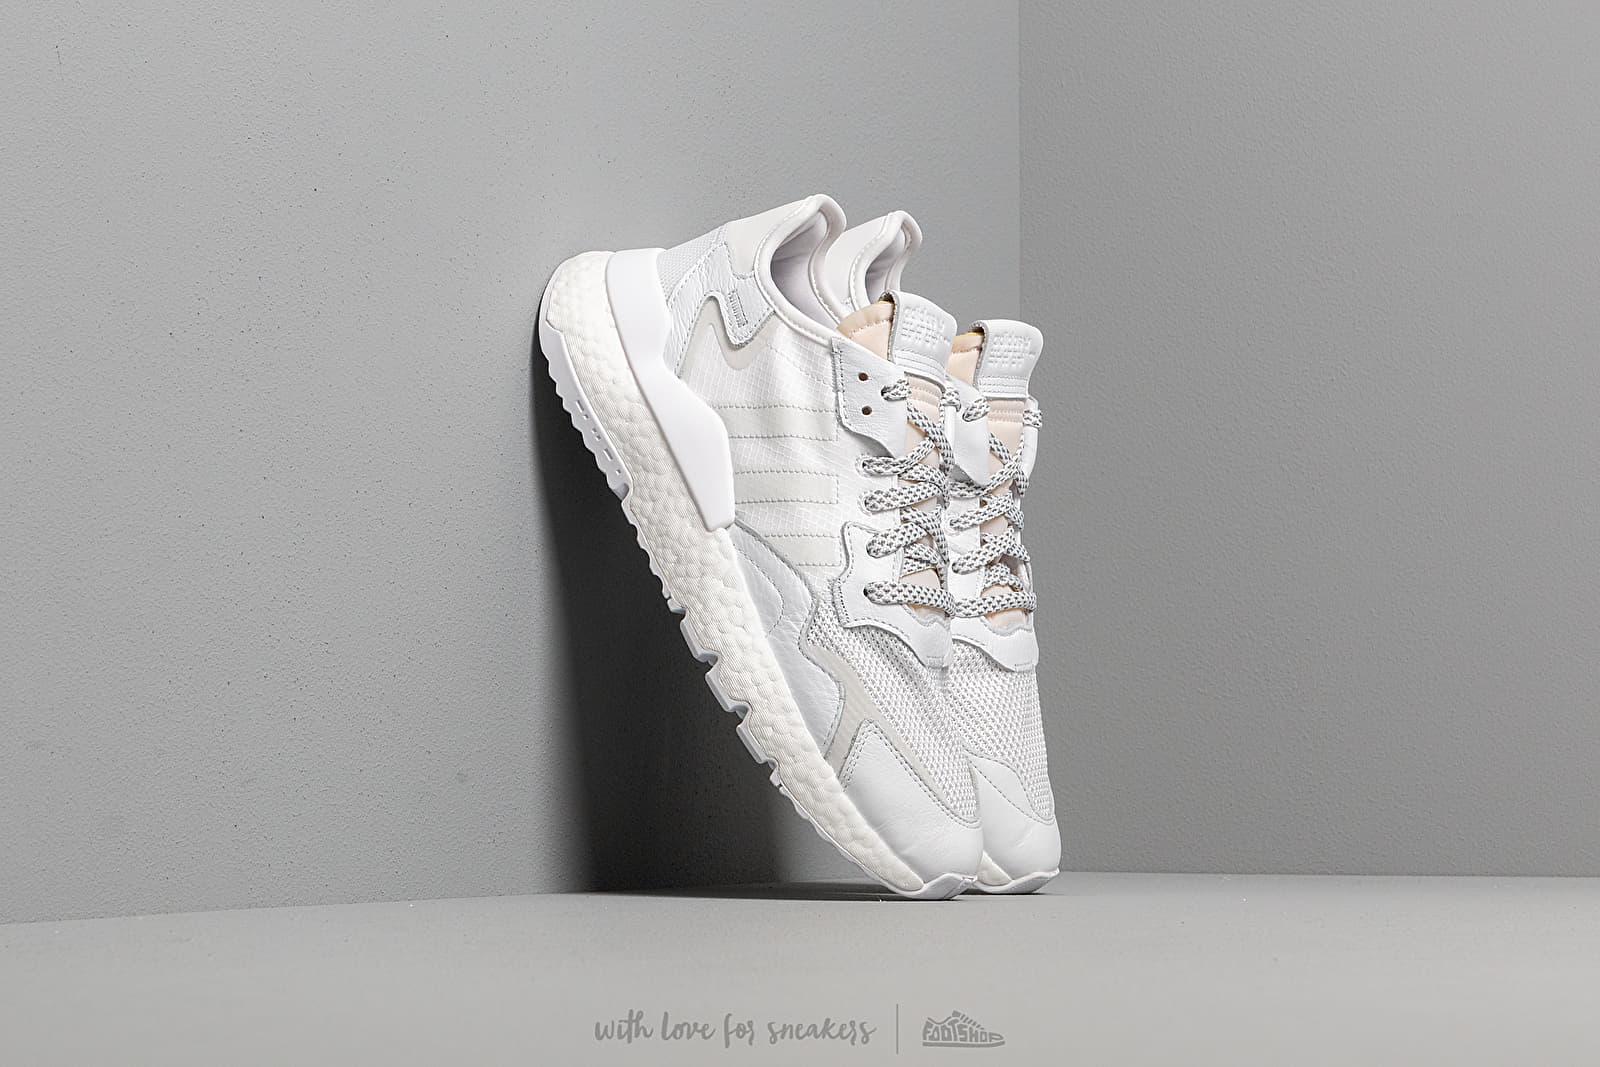 Nite White Adidas CrystalFootshop Jogger Ftw uJ3l5T1FKc